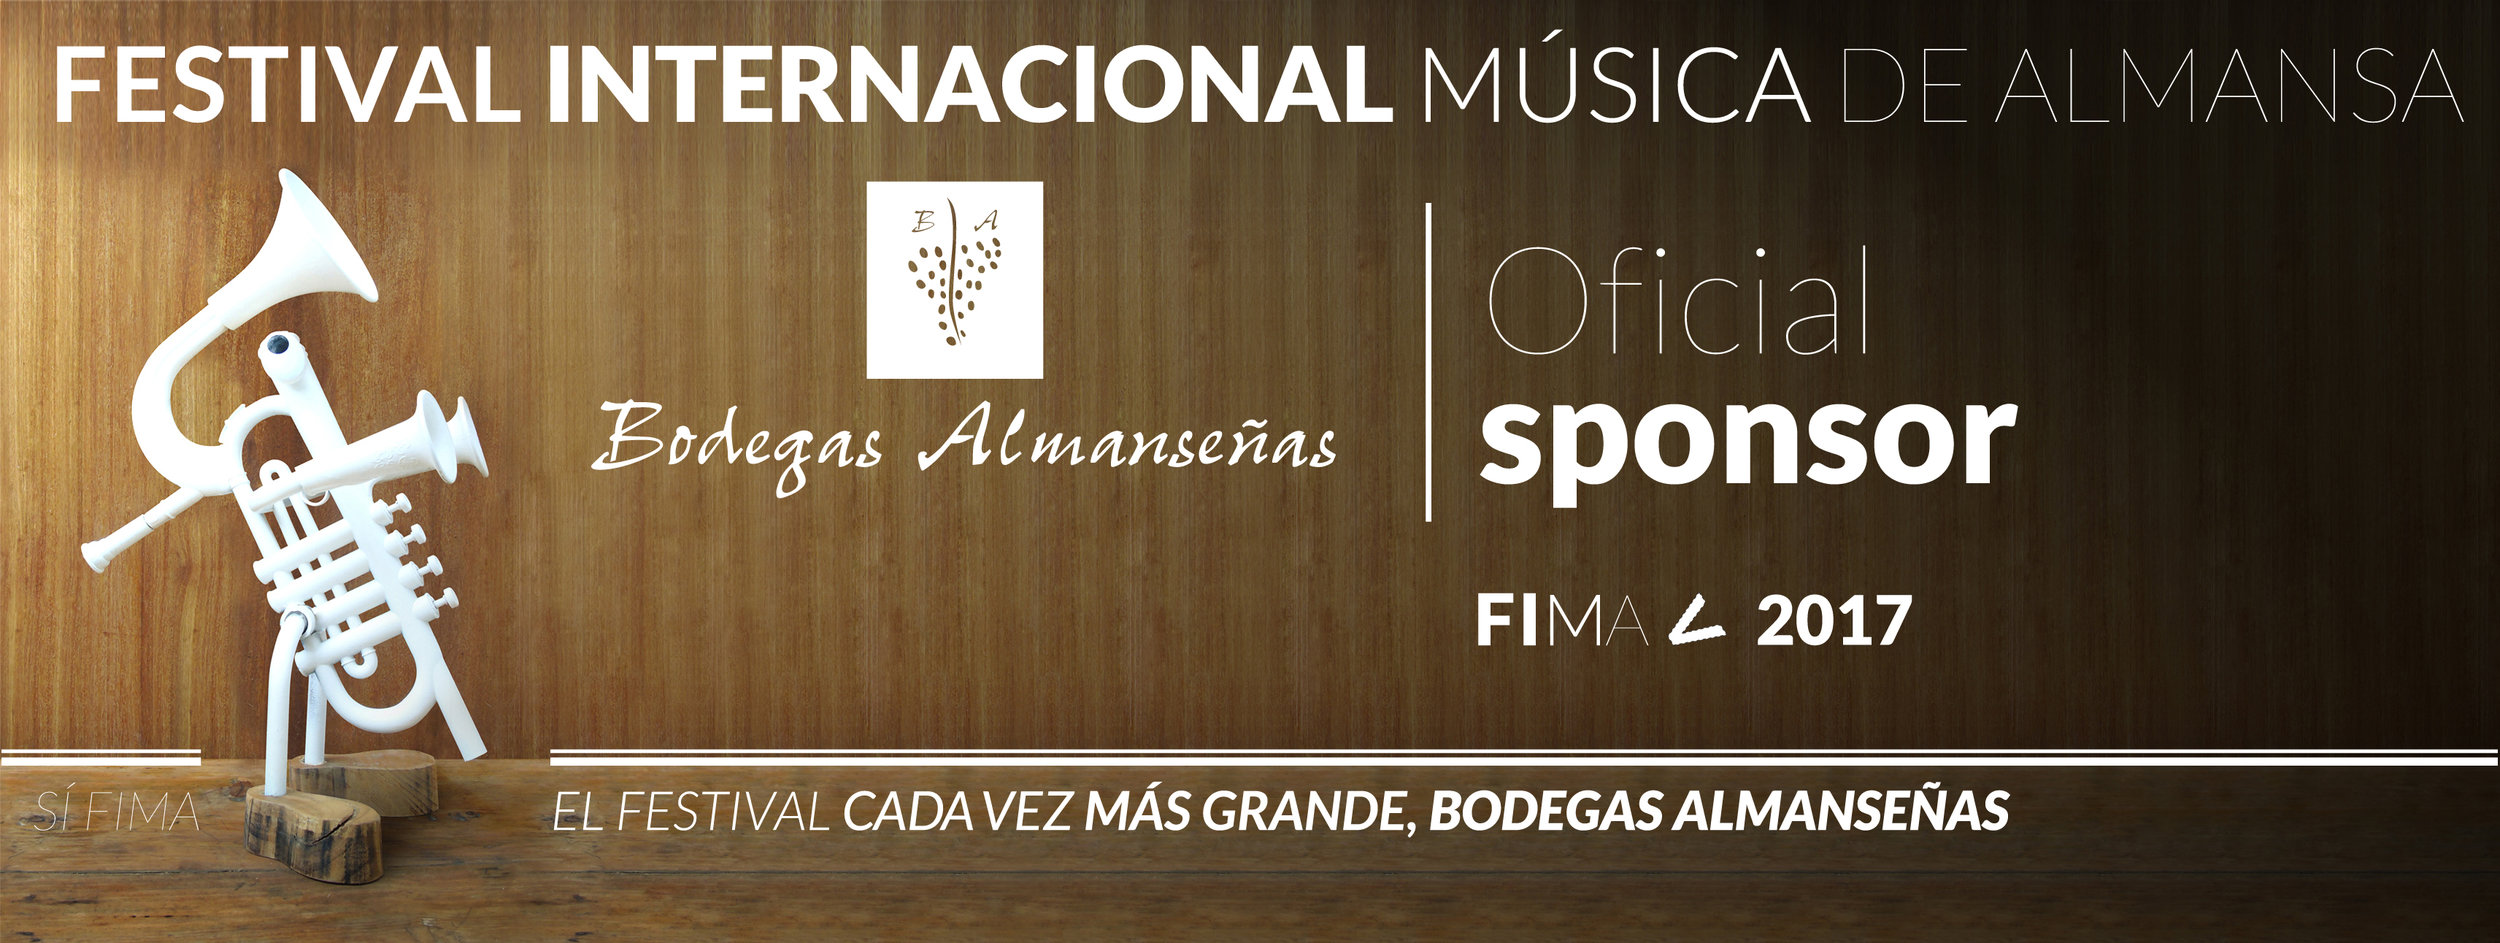 03_sponsor_bodegas_almanseñas.jpg